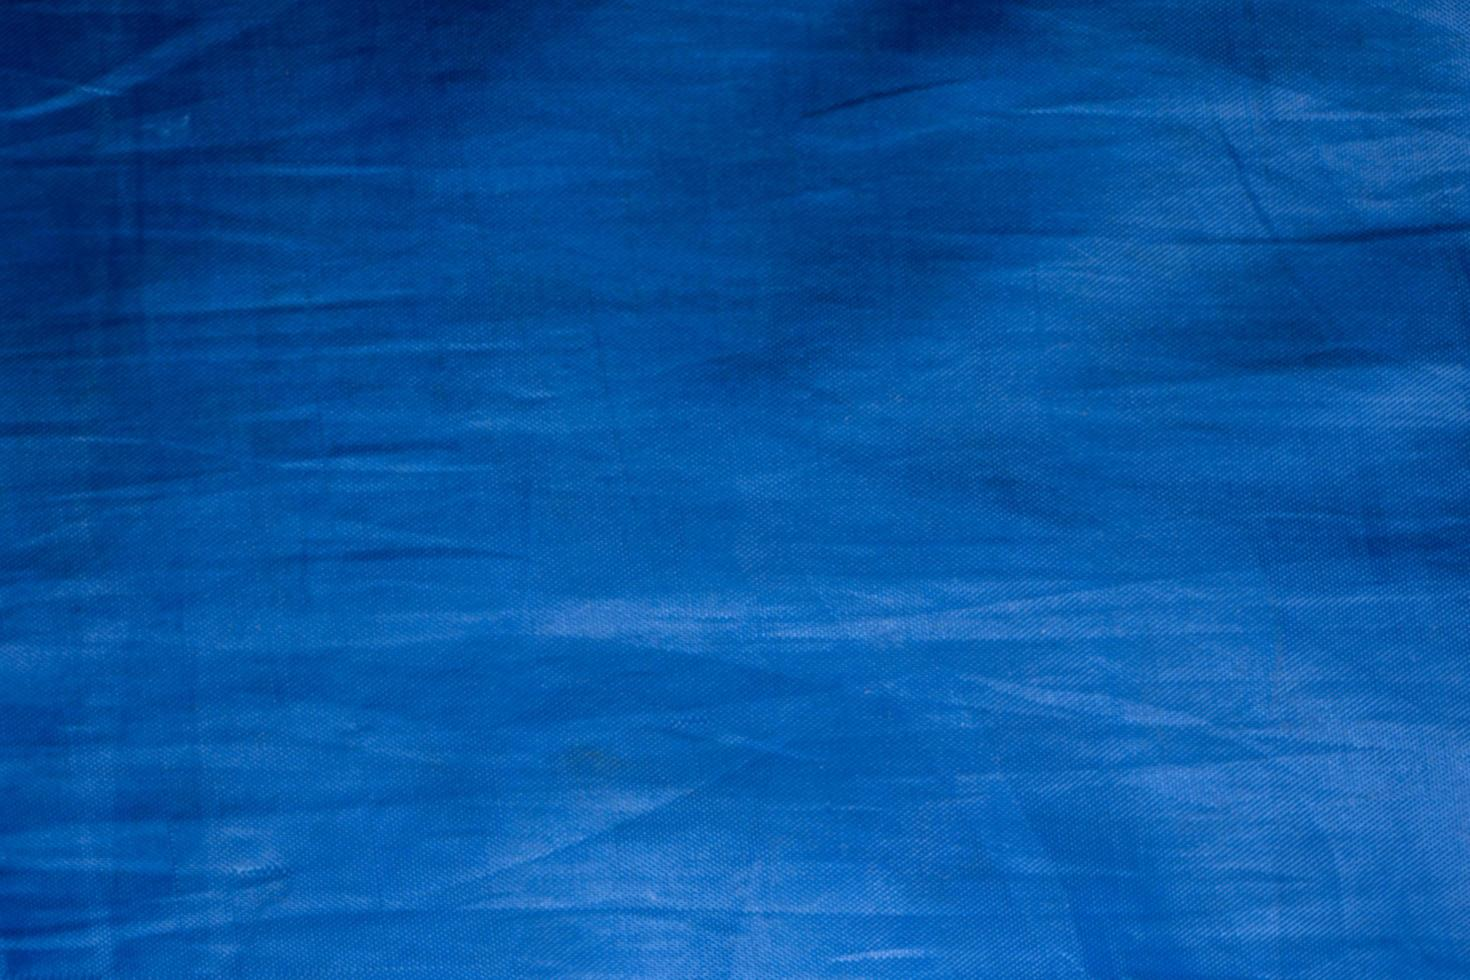 fondo azul textil foto